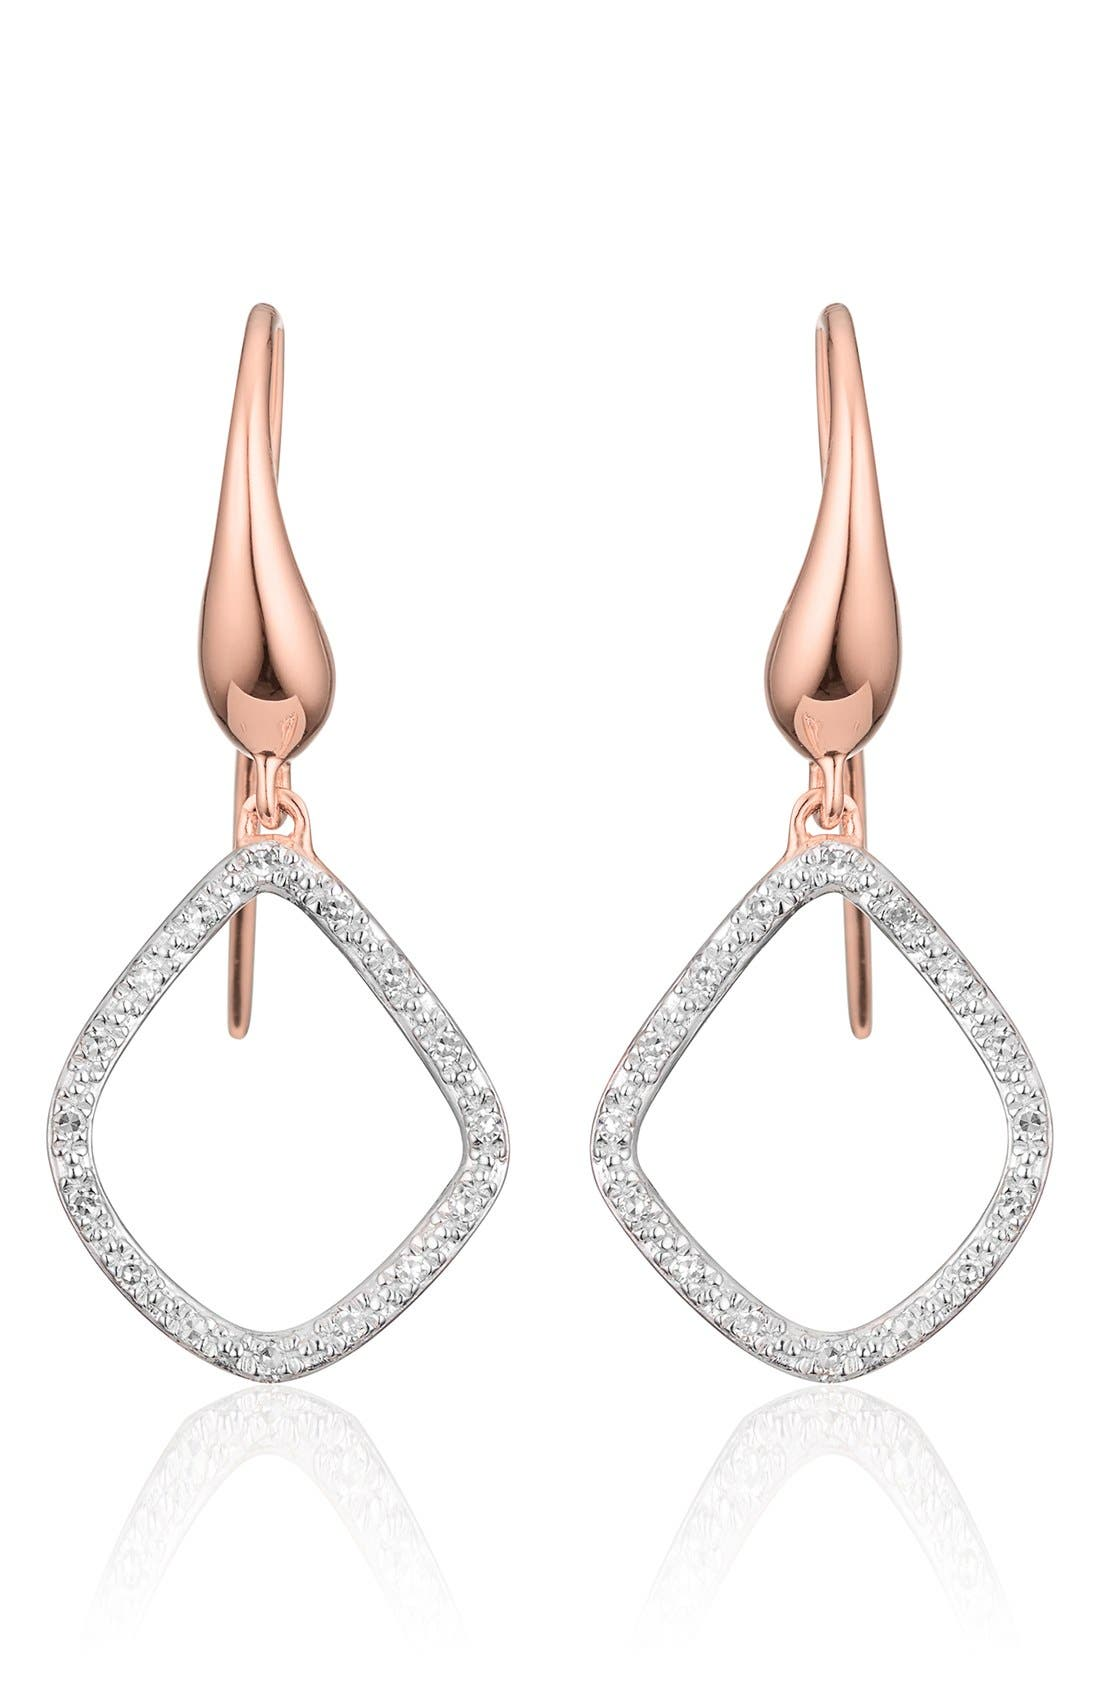 Monica Vinader 'Riva Kite' Diamond Drop Earrings